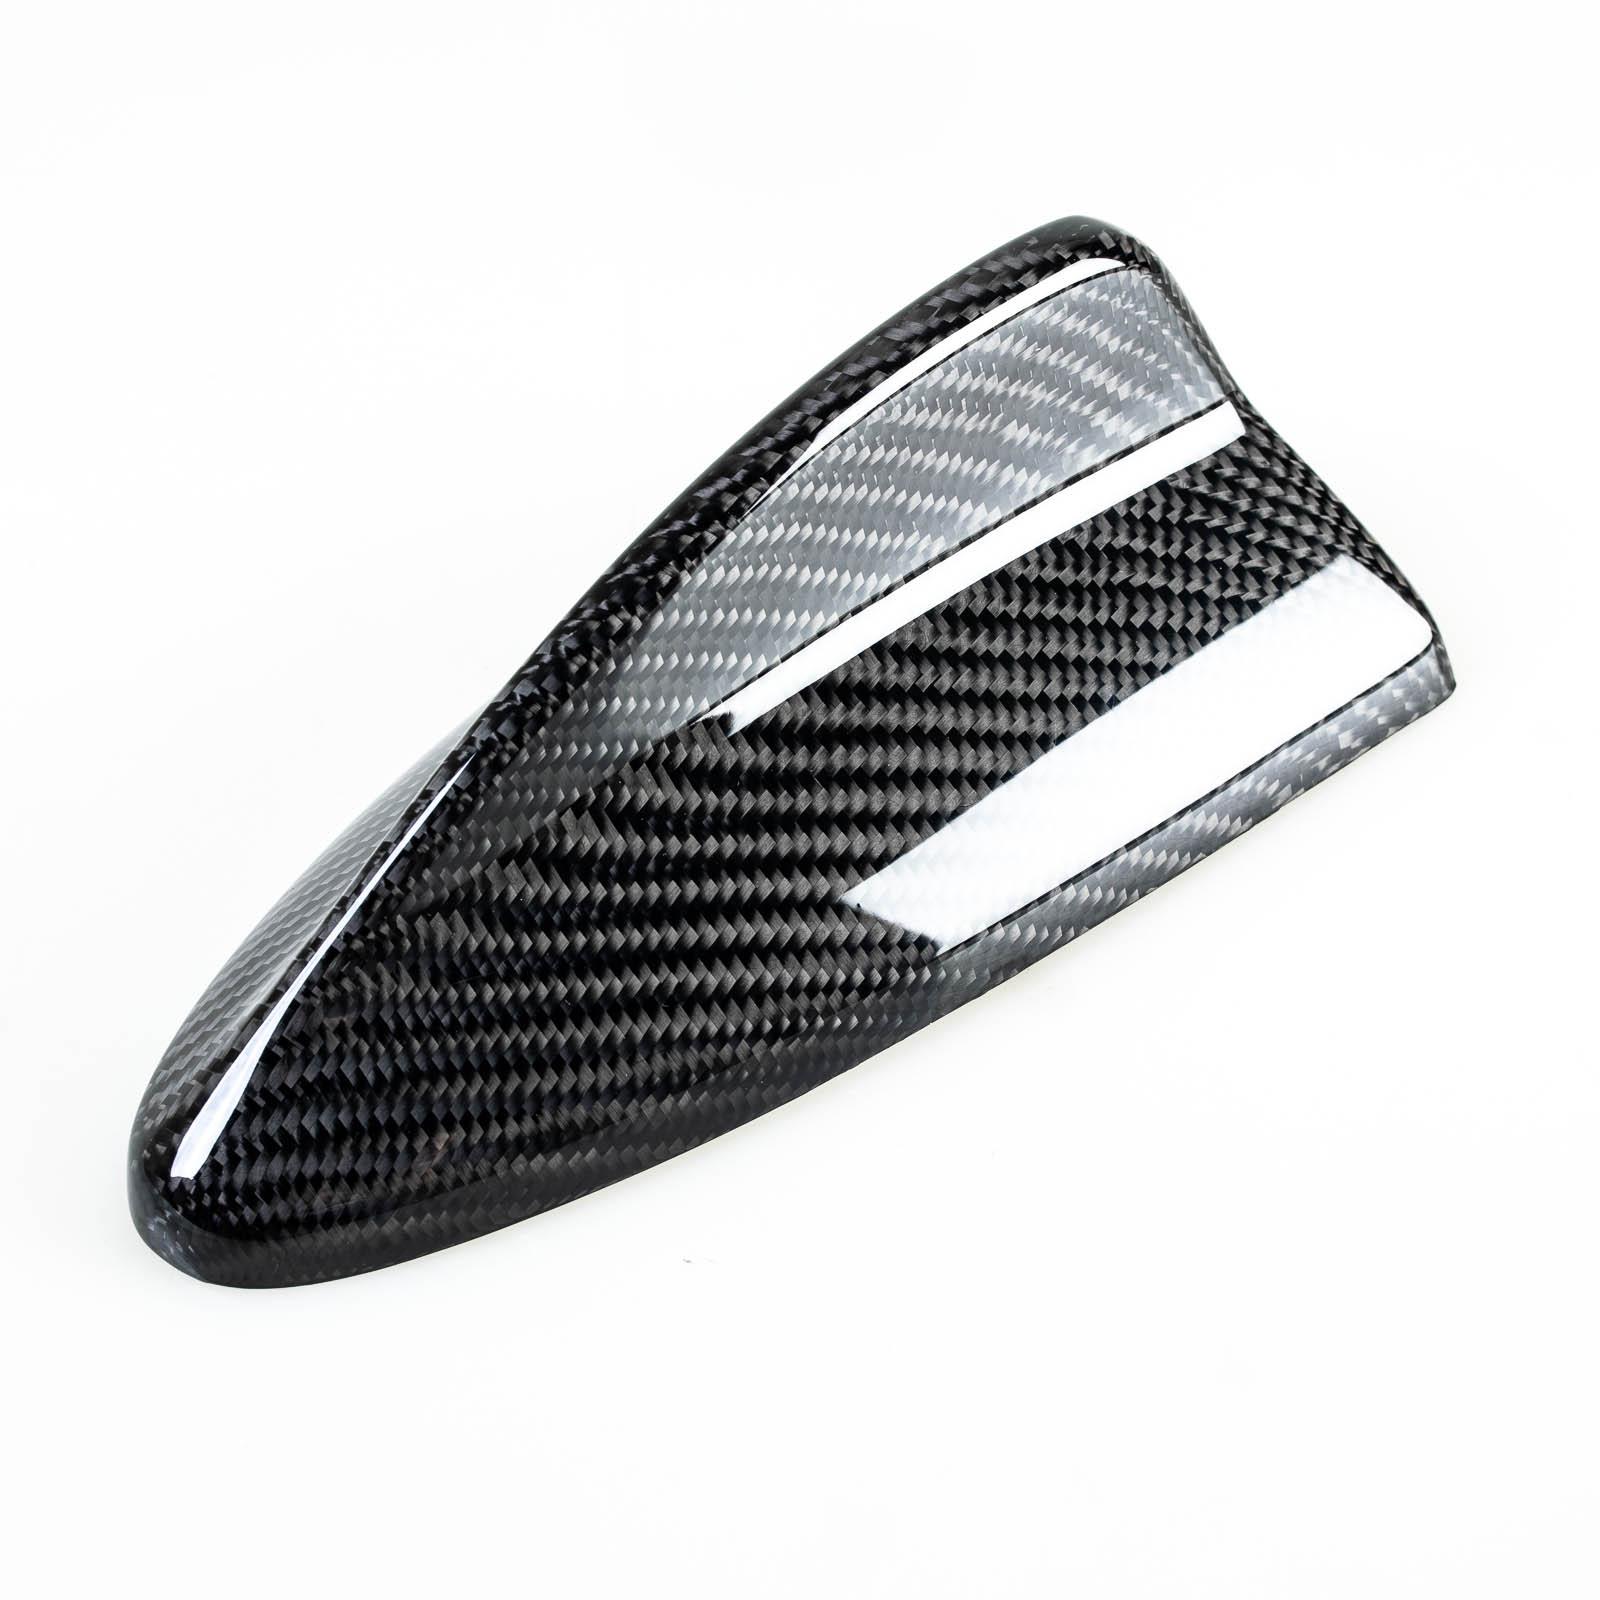 Carbon Fiber Fibre Shark Fin Antenna For BMW M3 Look